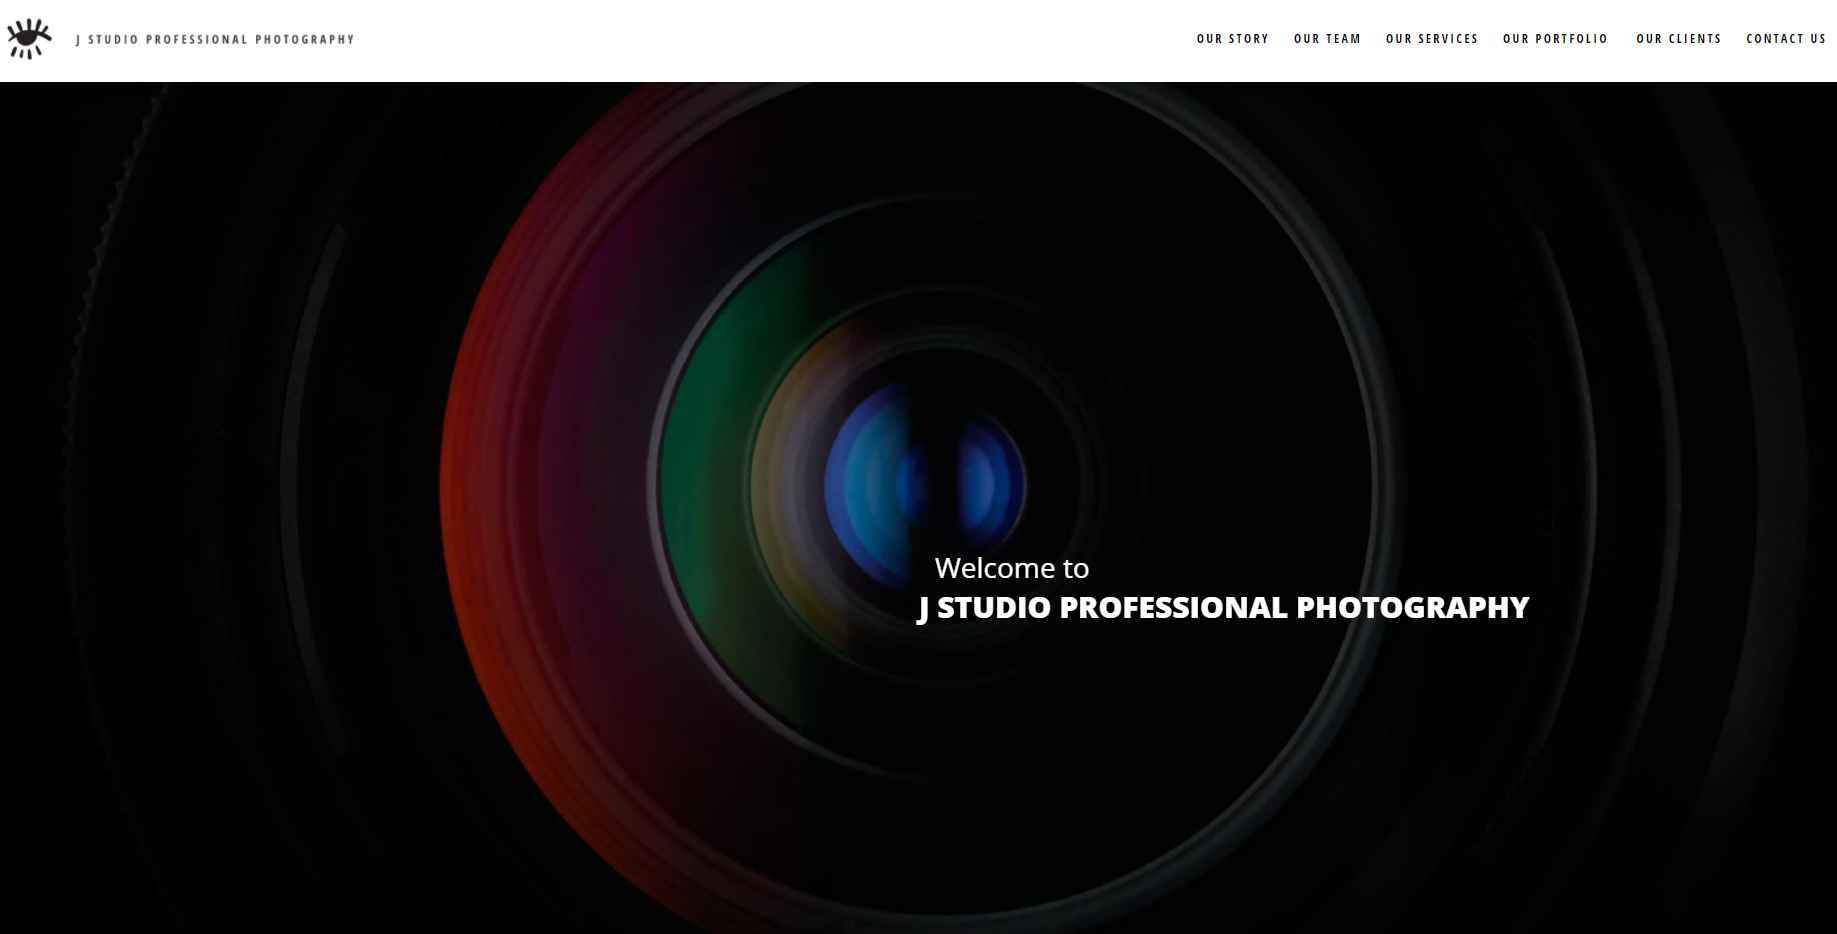 Jstudio Digital Photography Top Portrait Photography Studios in Singapore